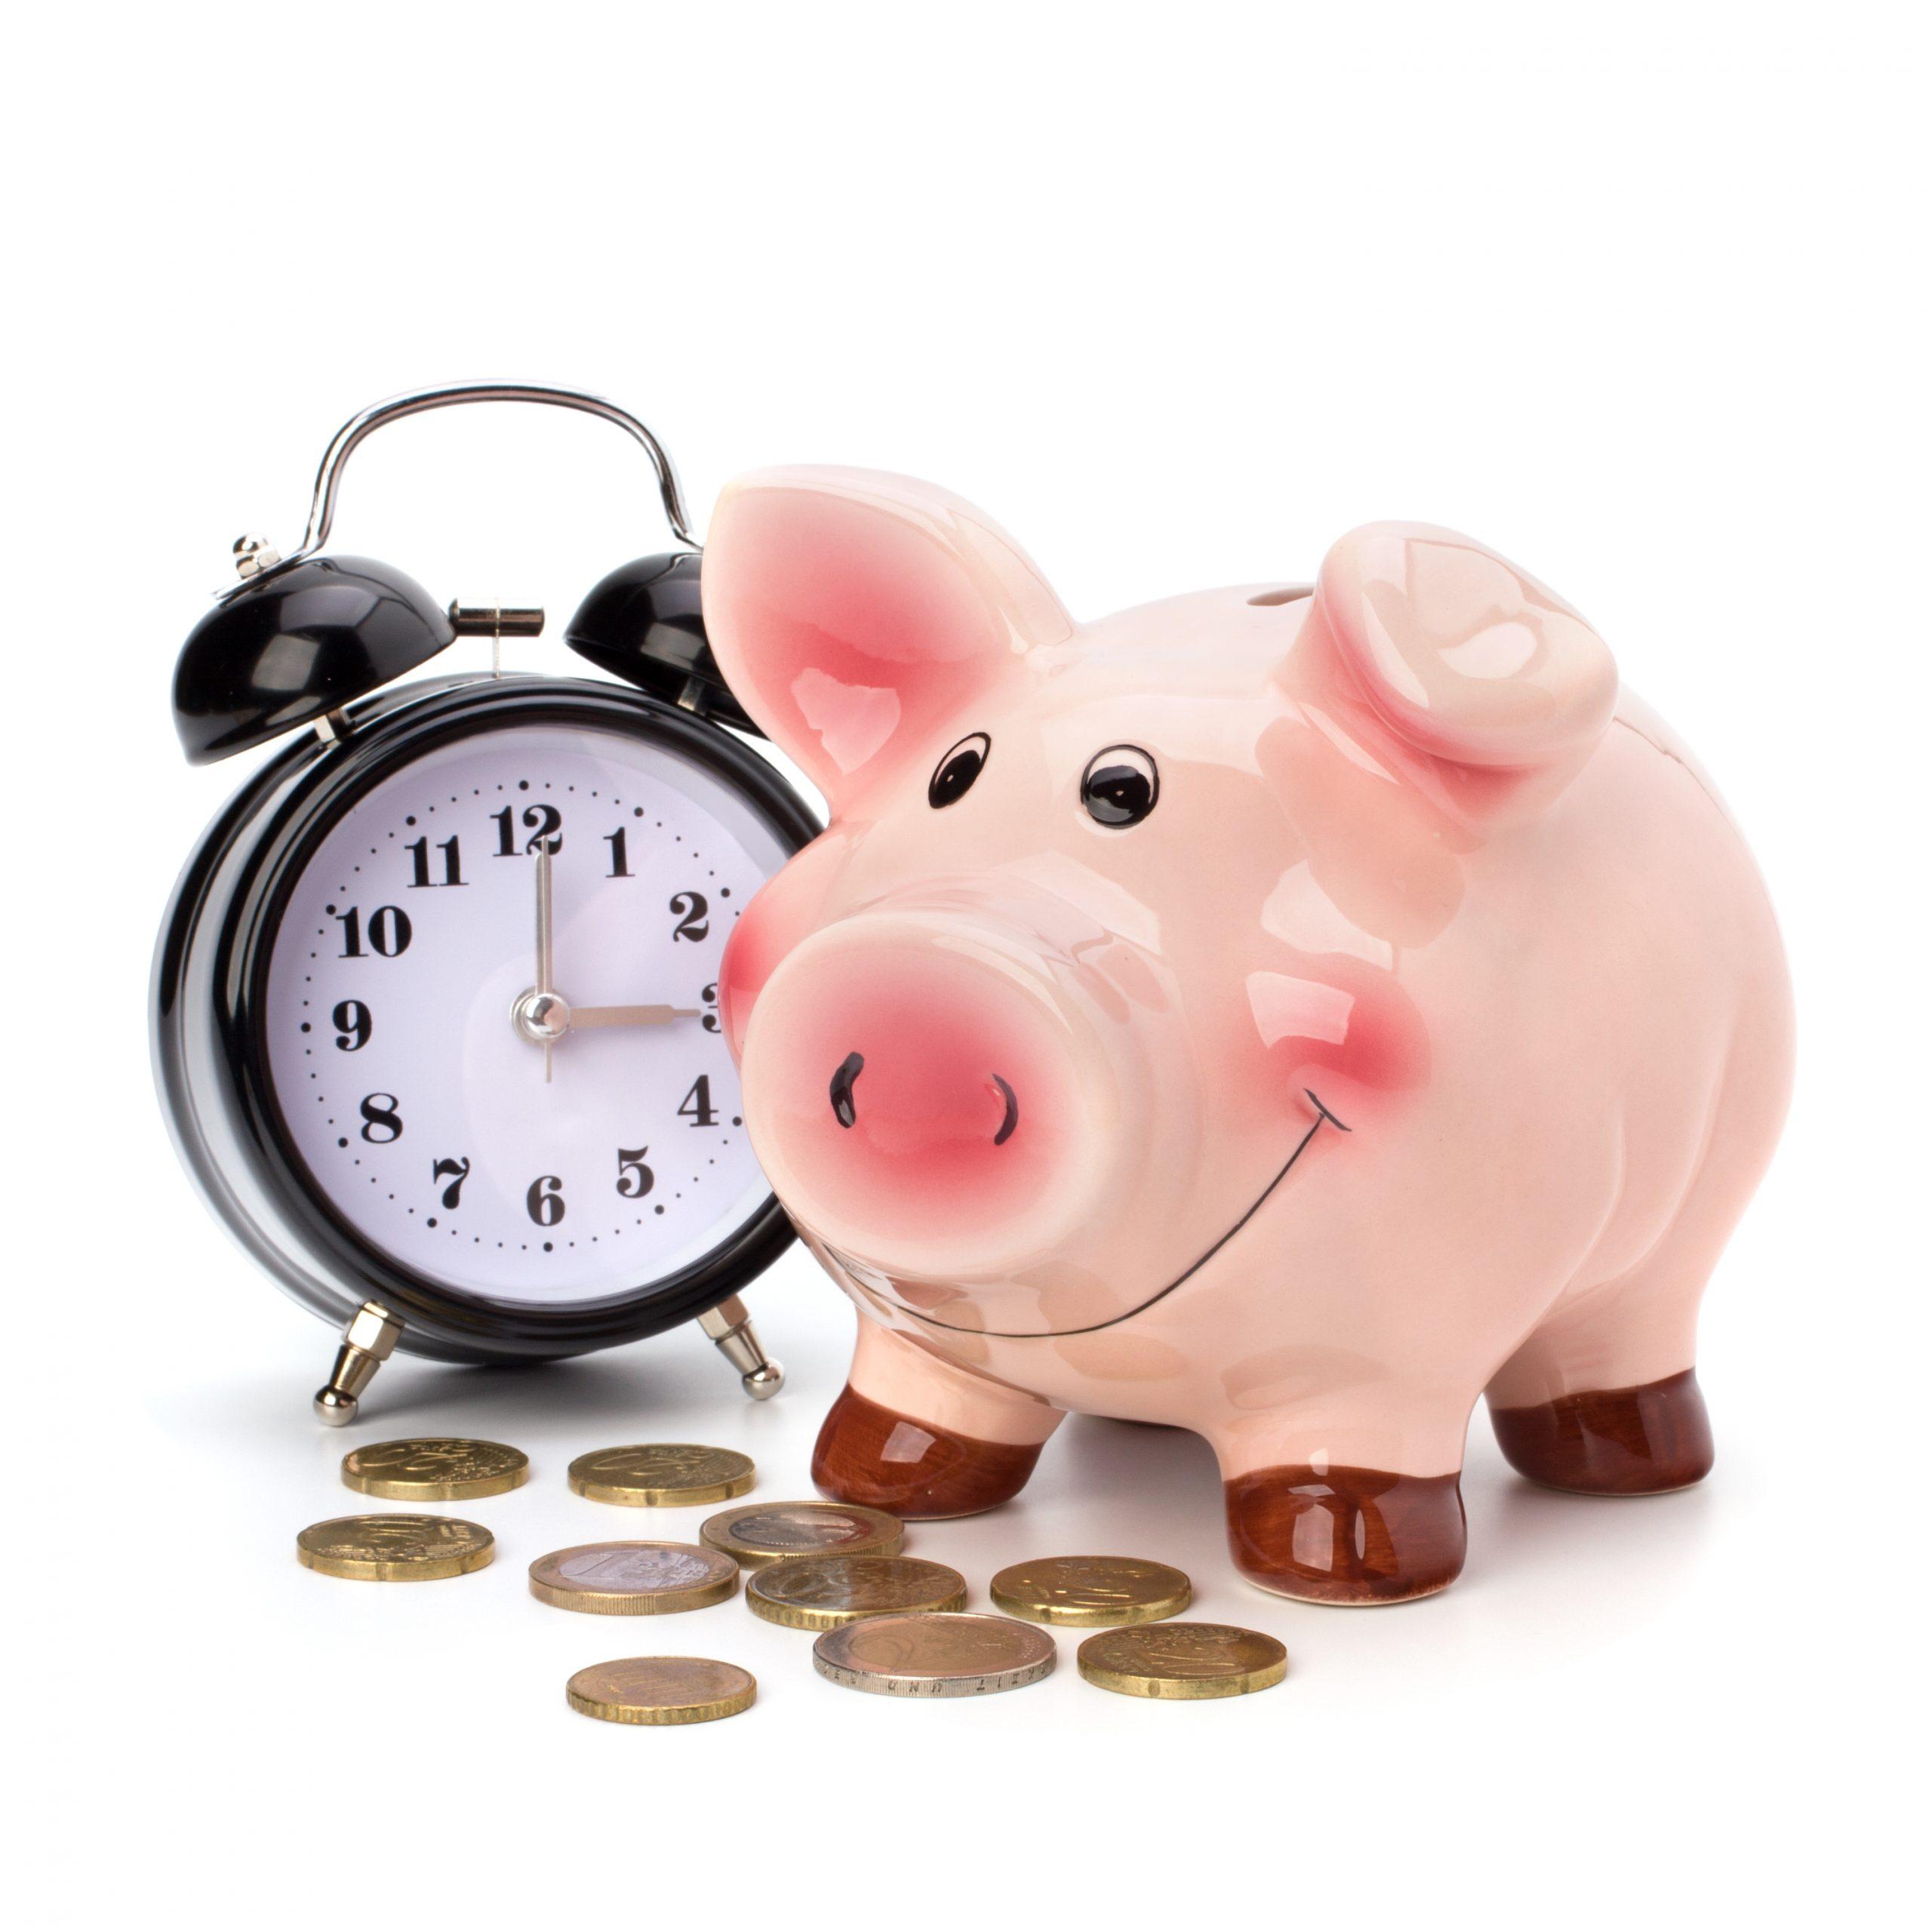 PIGGY BANK WITH CLOCK